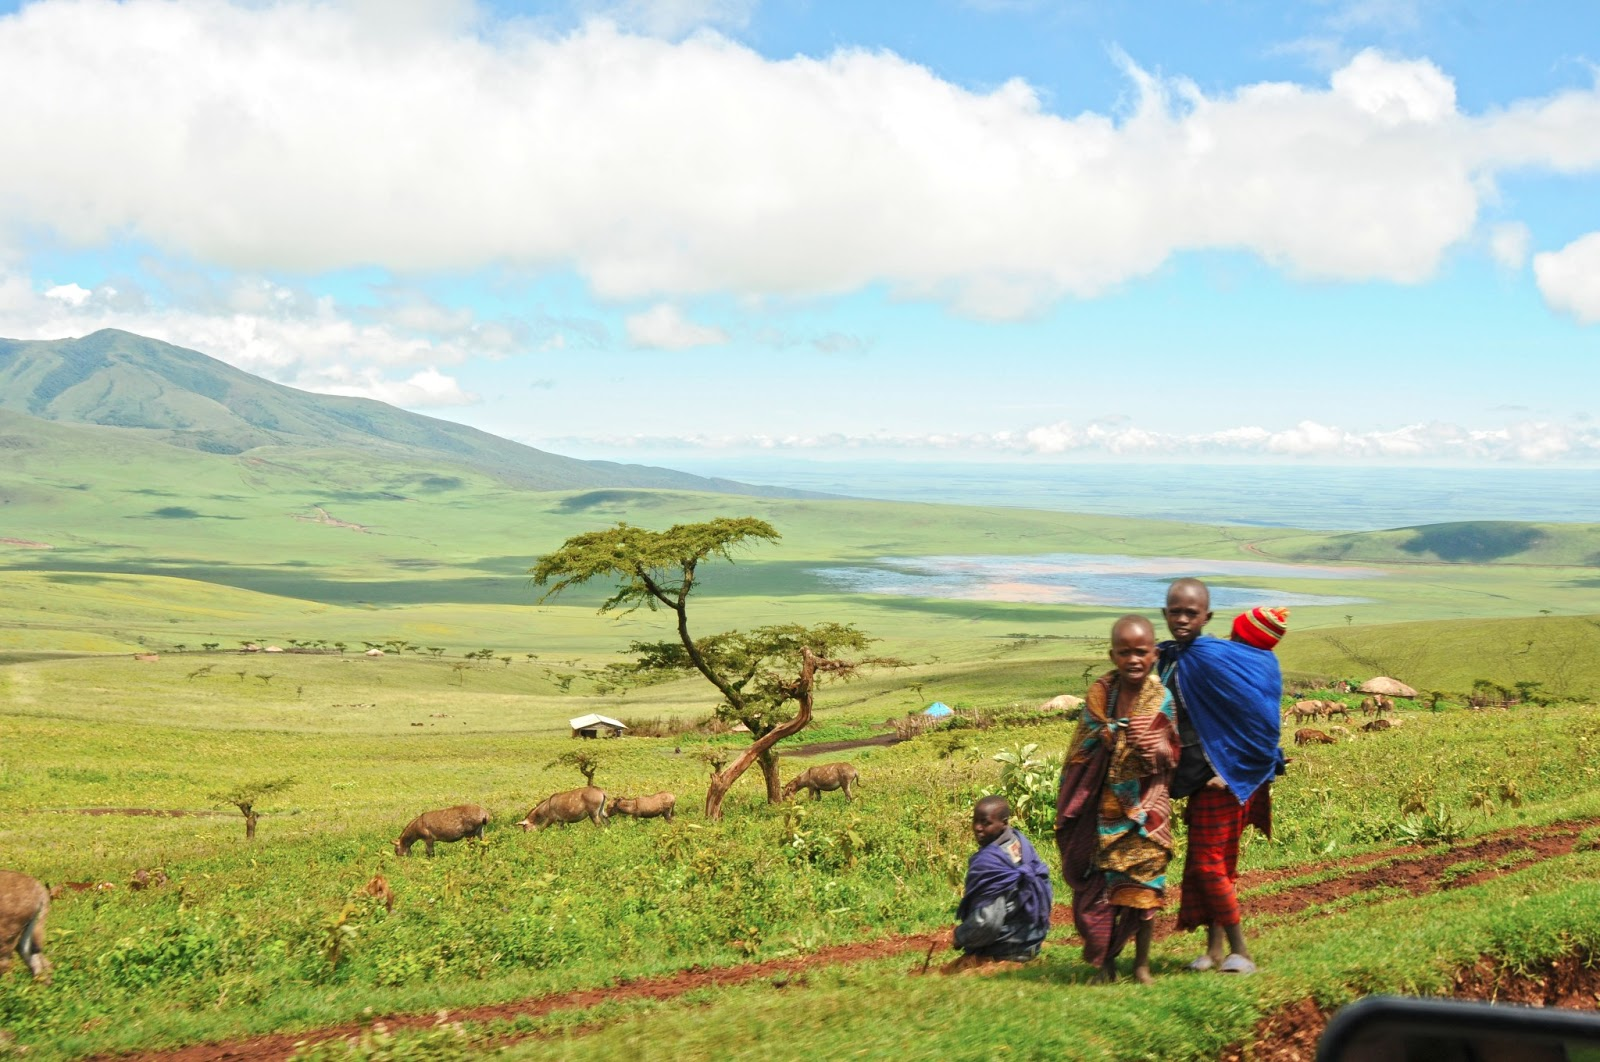 Anak-anak Maasai menggembala ternak nya